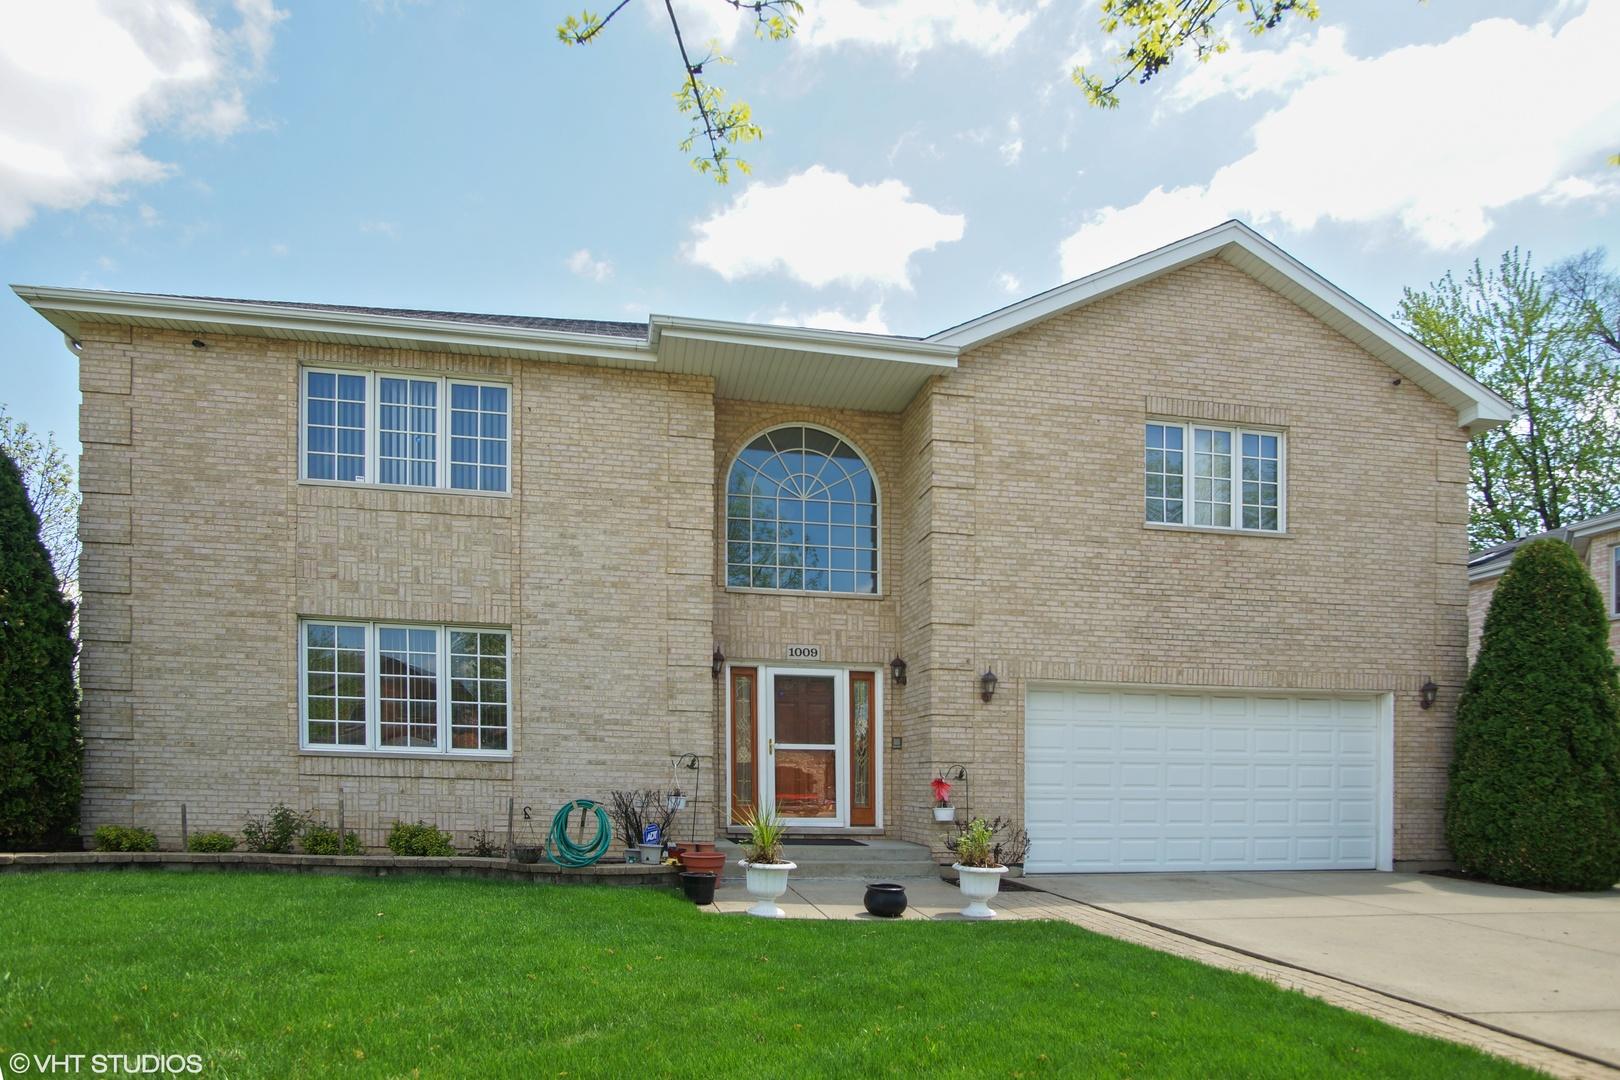 1009 Wildwood Lane, Mount Prospect, IL 60056